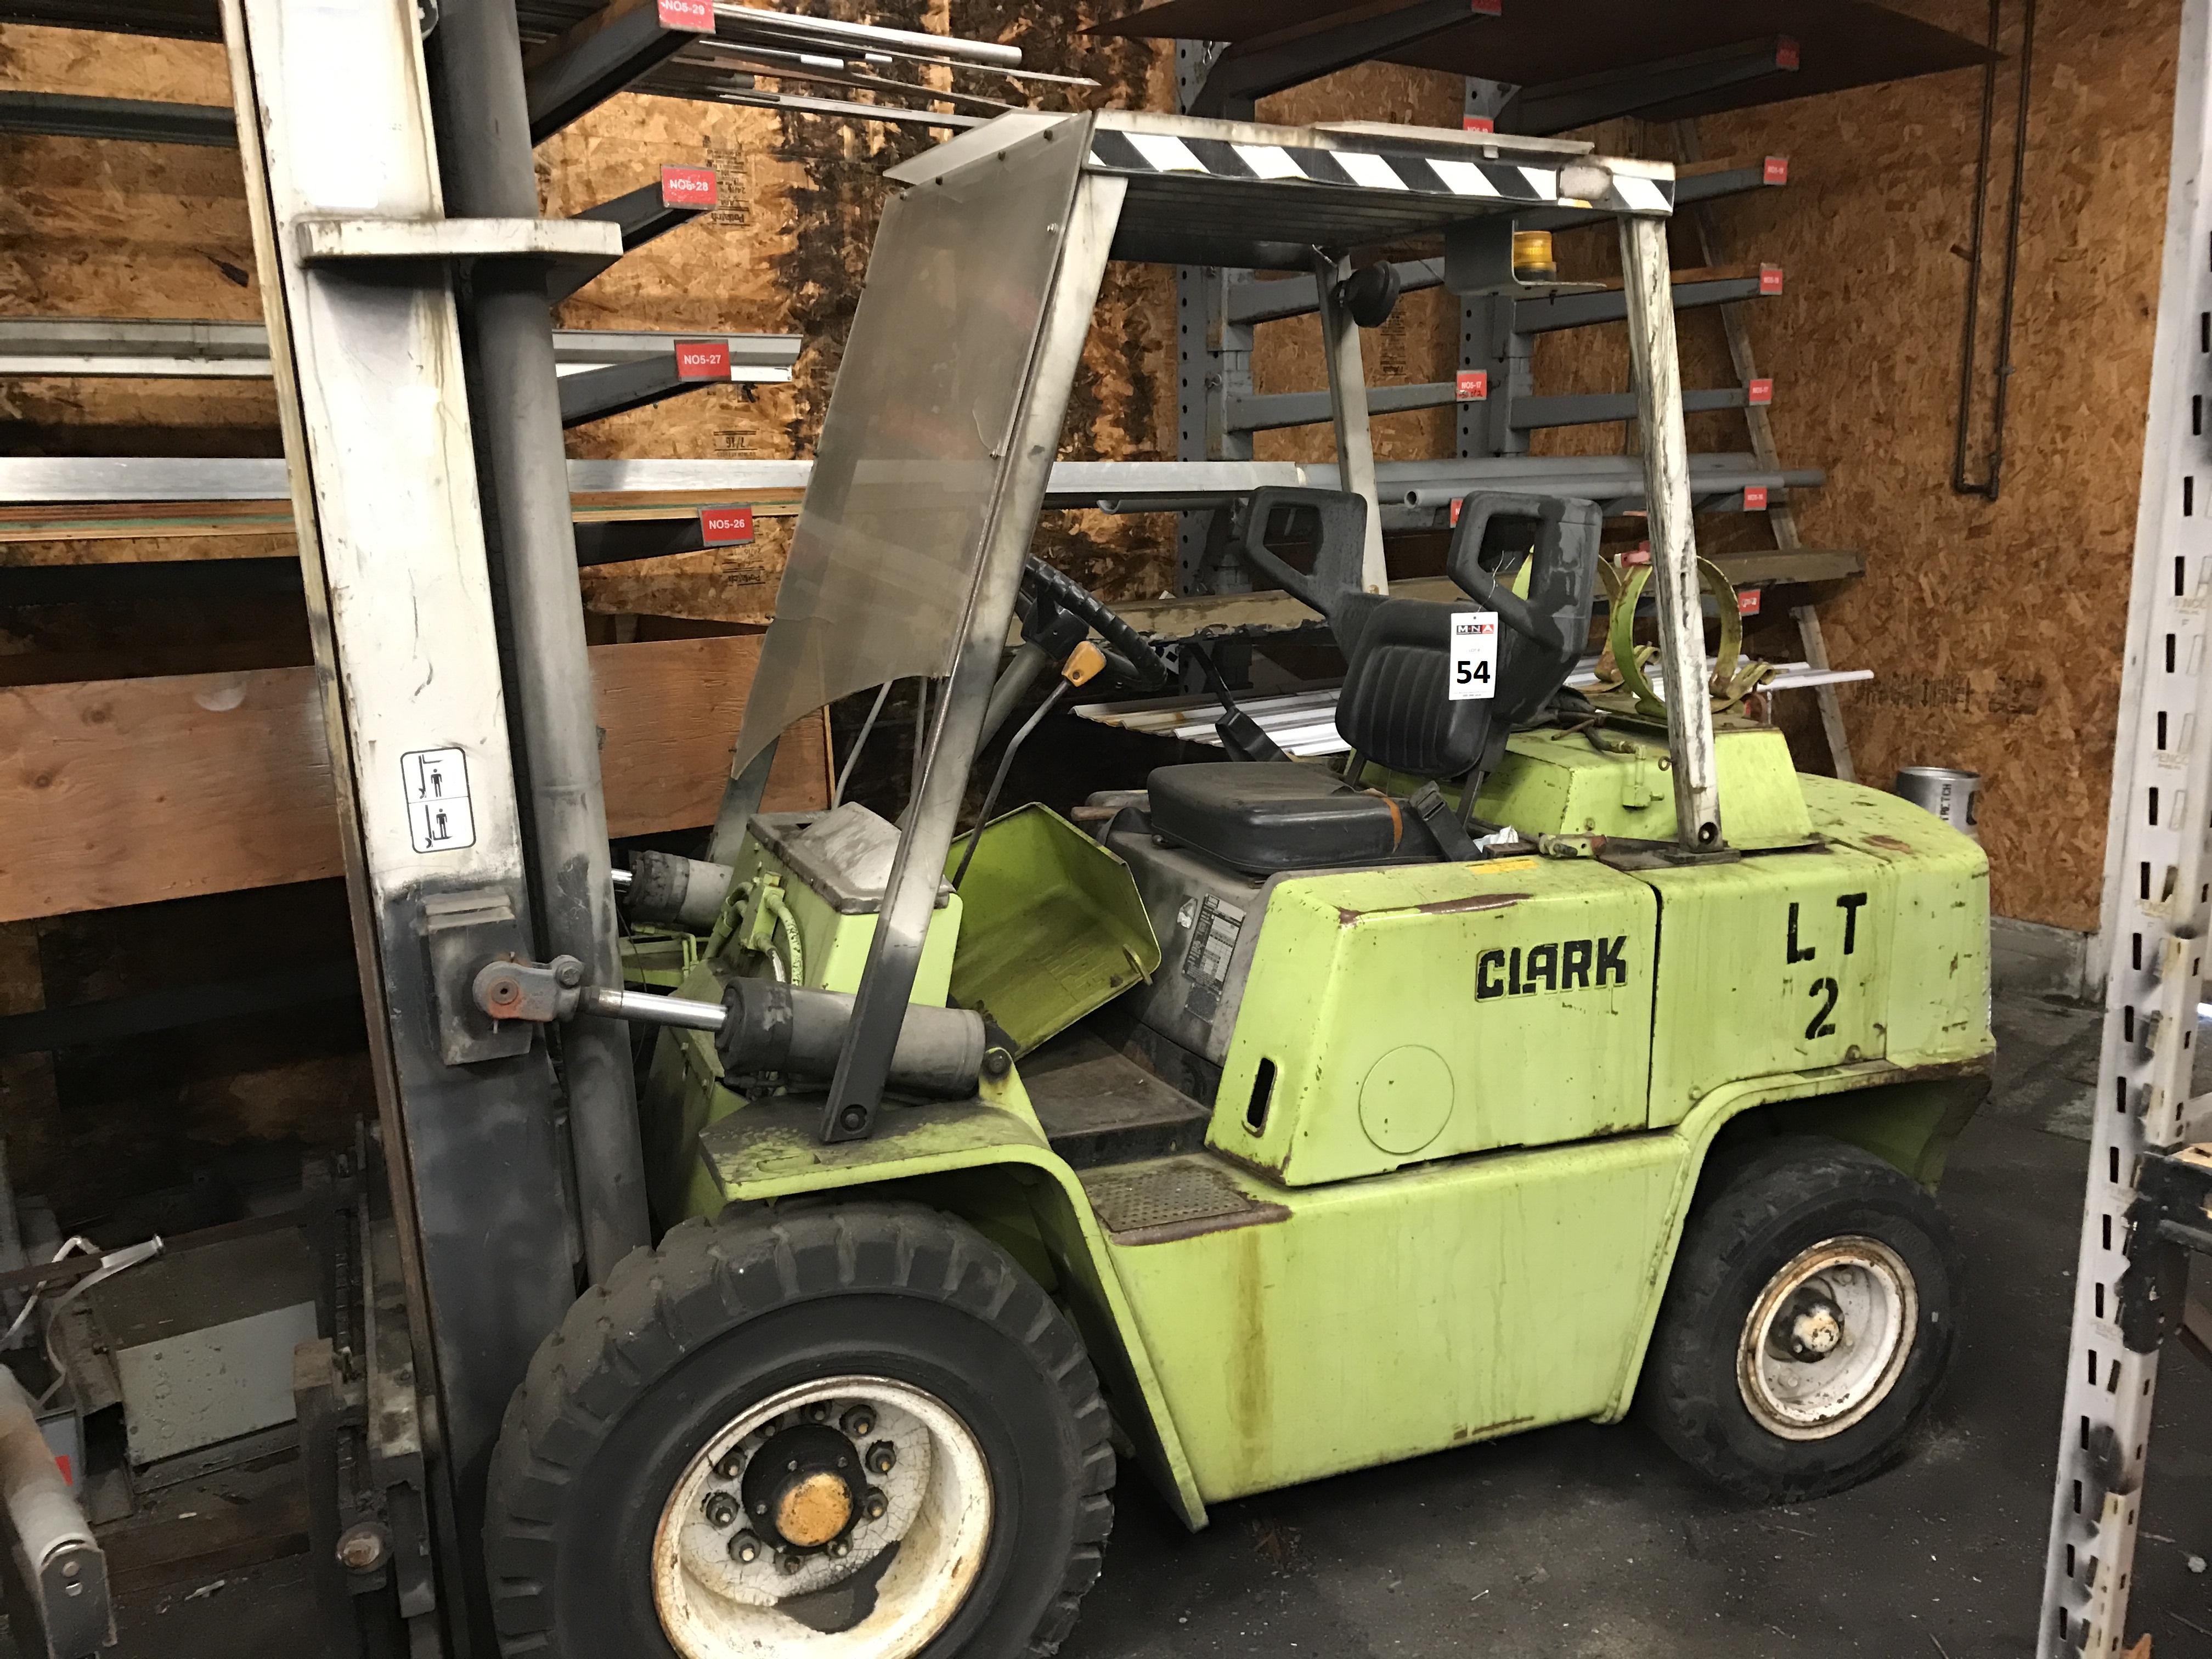 Clark C500-ys80 Forklift Truck  7425 Lb Capacity  S  N Y685-0250-5960fa